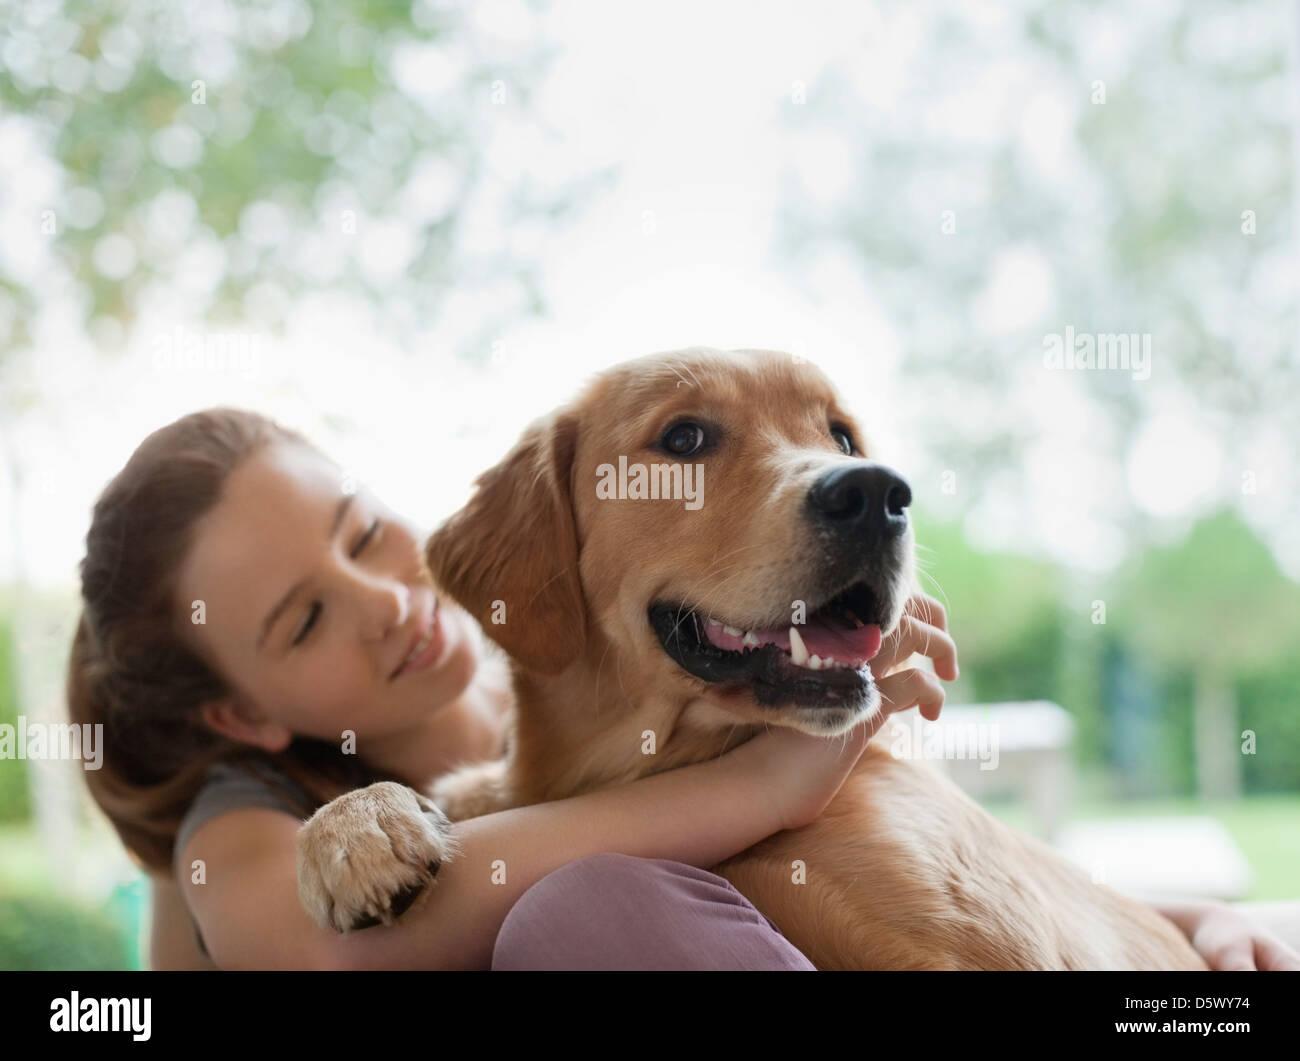 Smiling girl hugging dog outdoors - Stock Image